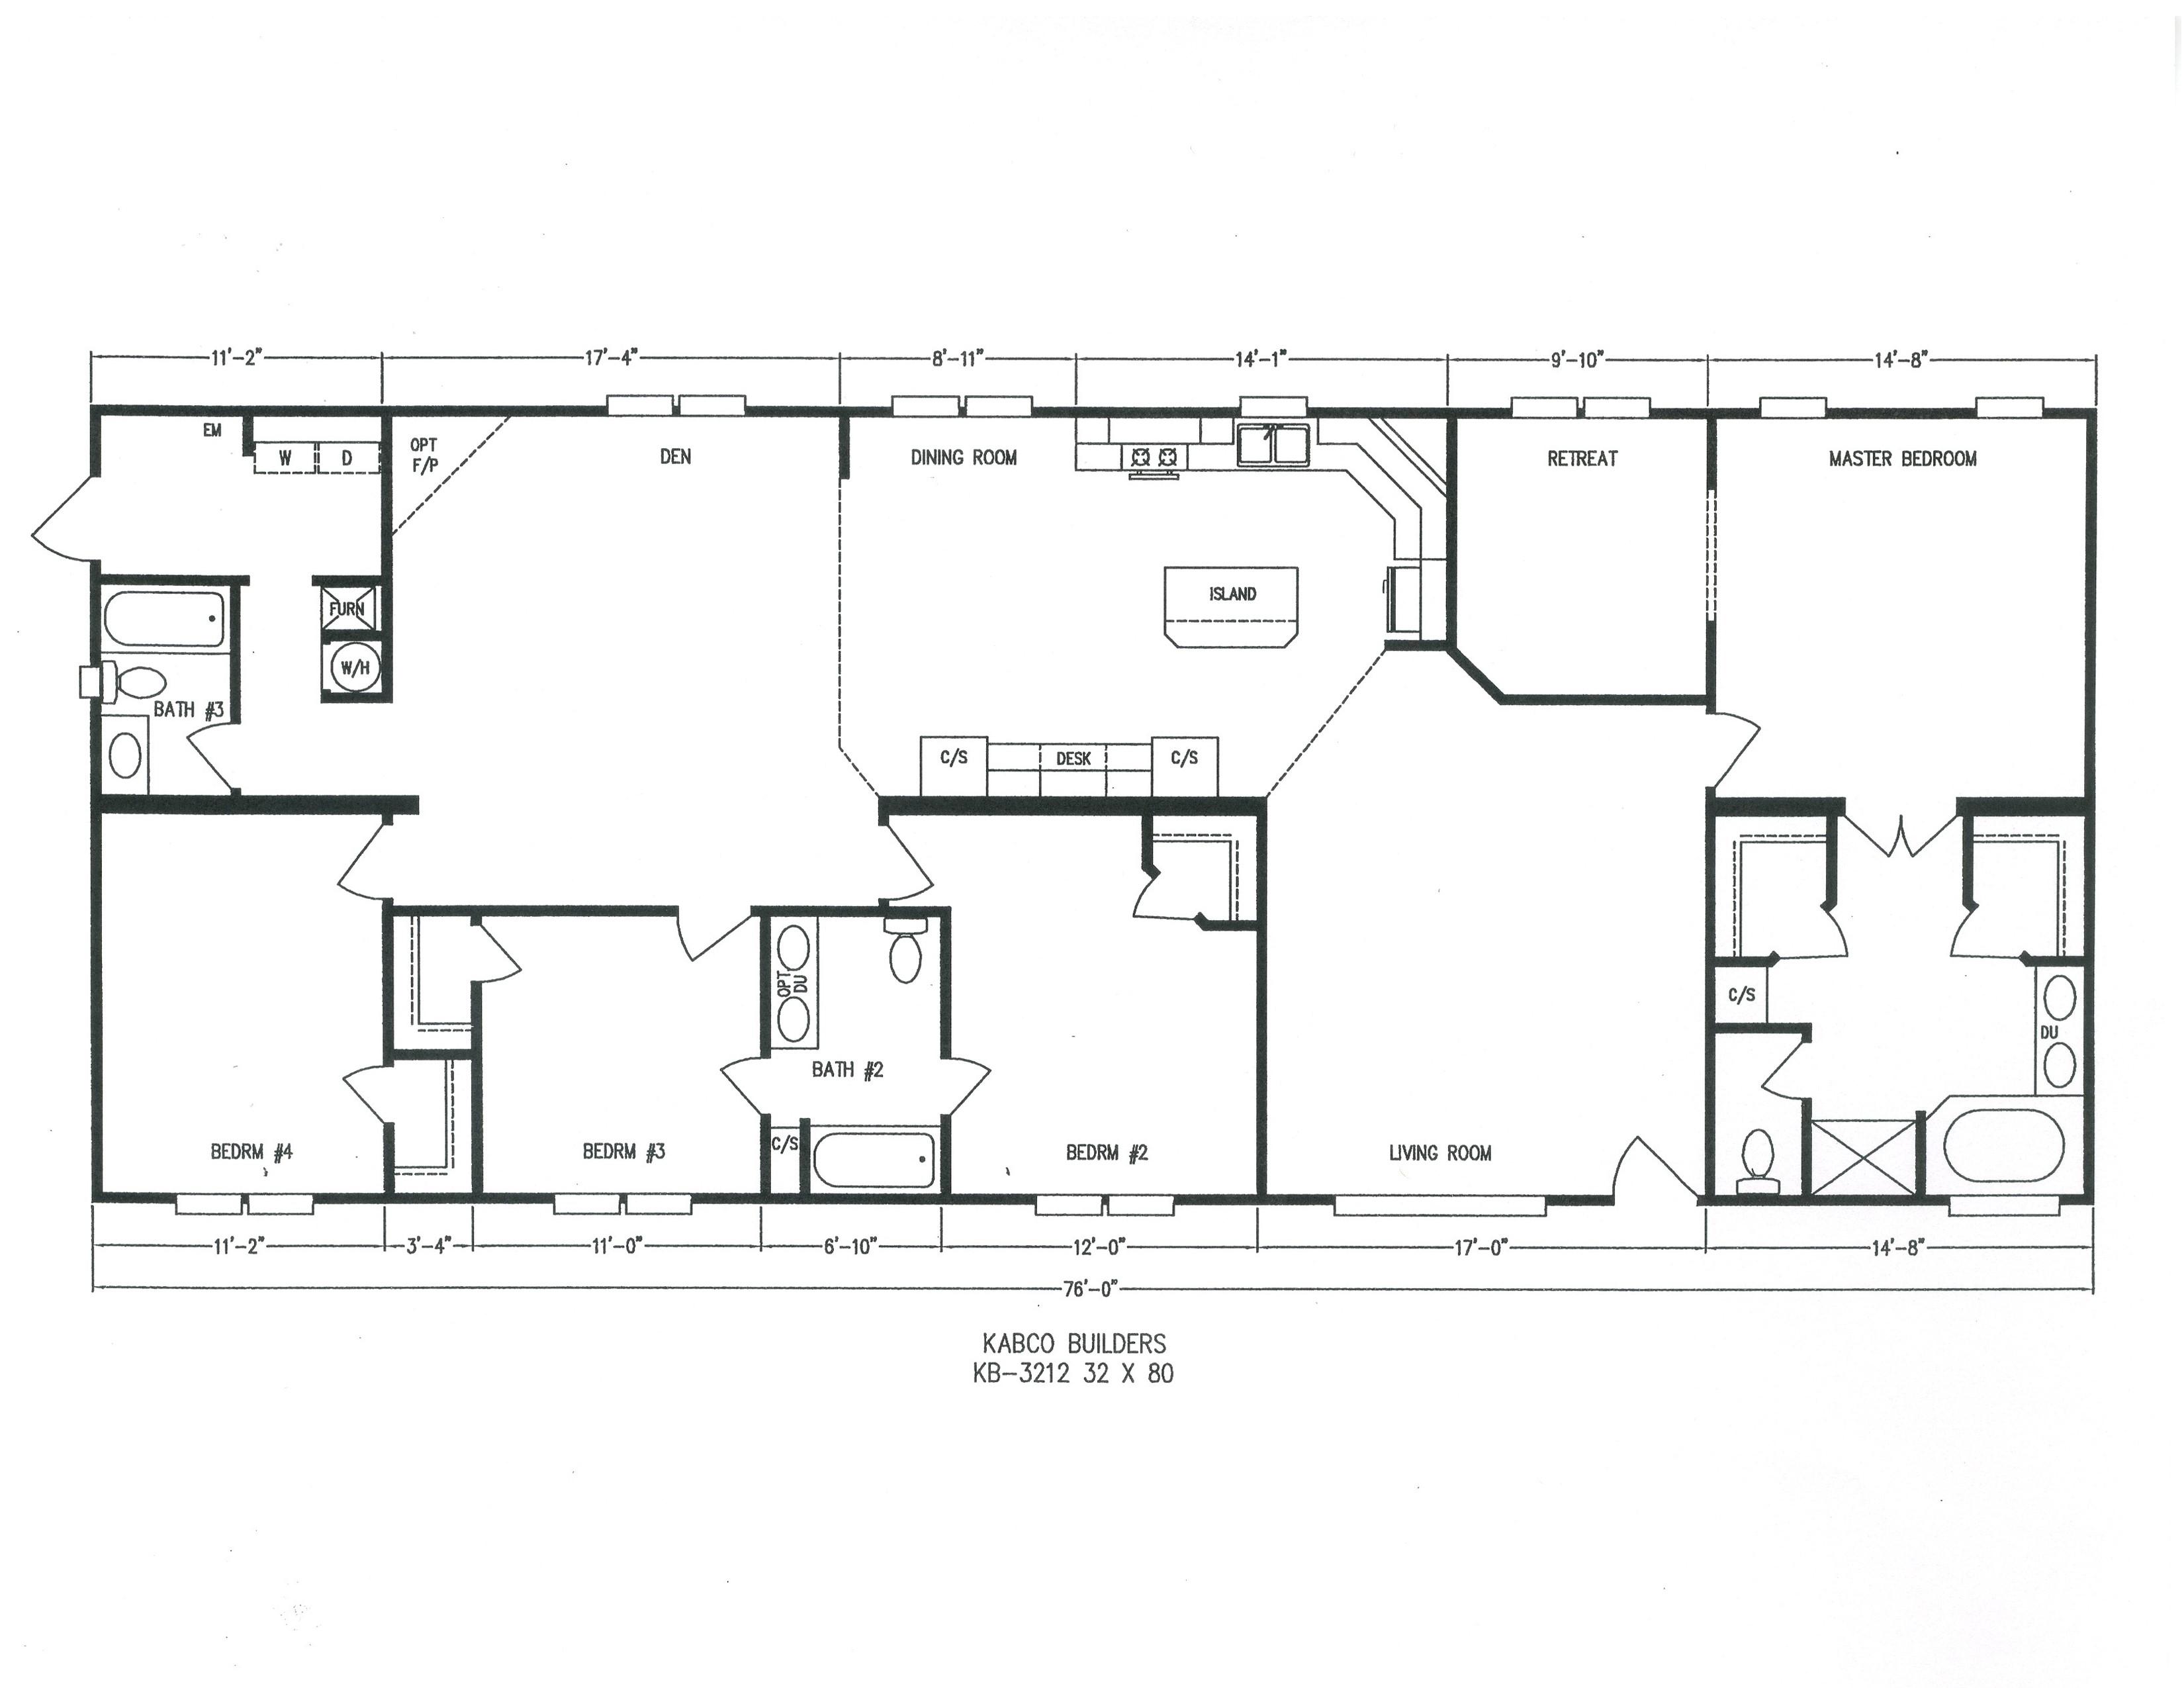 Bolton Homes In Alexandria La Manufactured Home Dealer